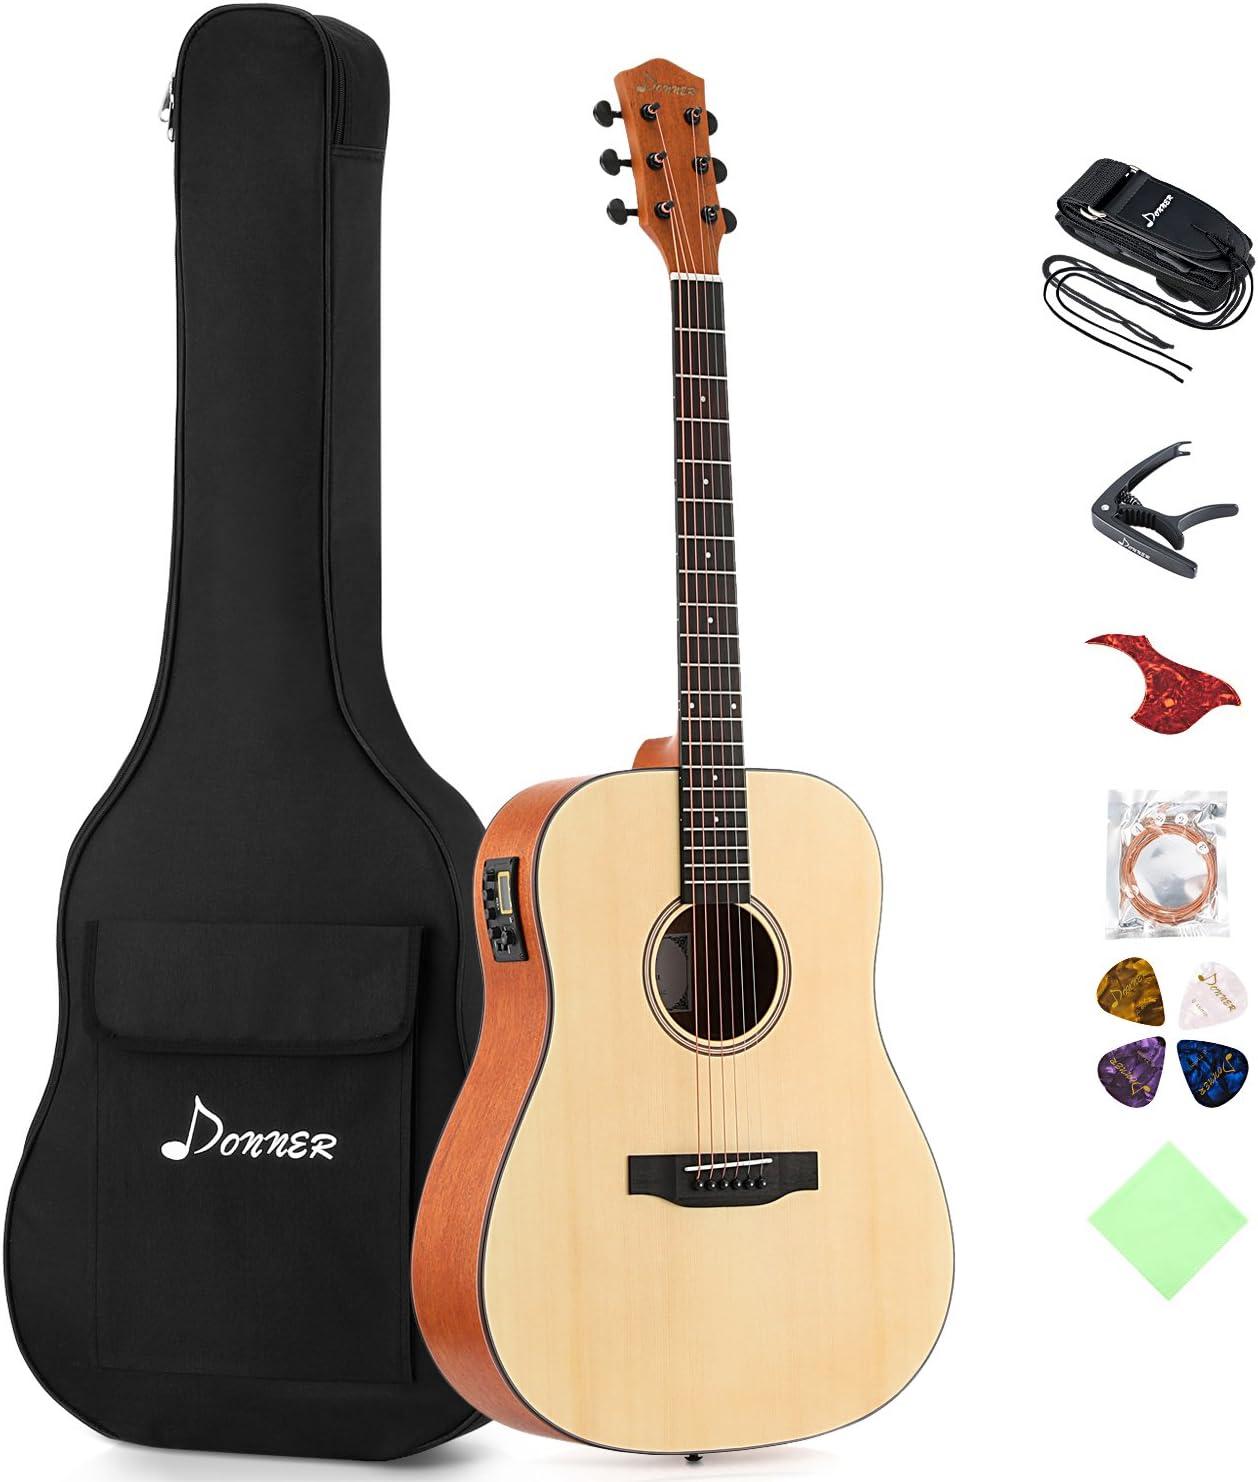 Donner dag-1e eléctrica de guitarra acústica tamaño completo 41 ...